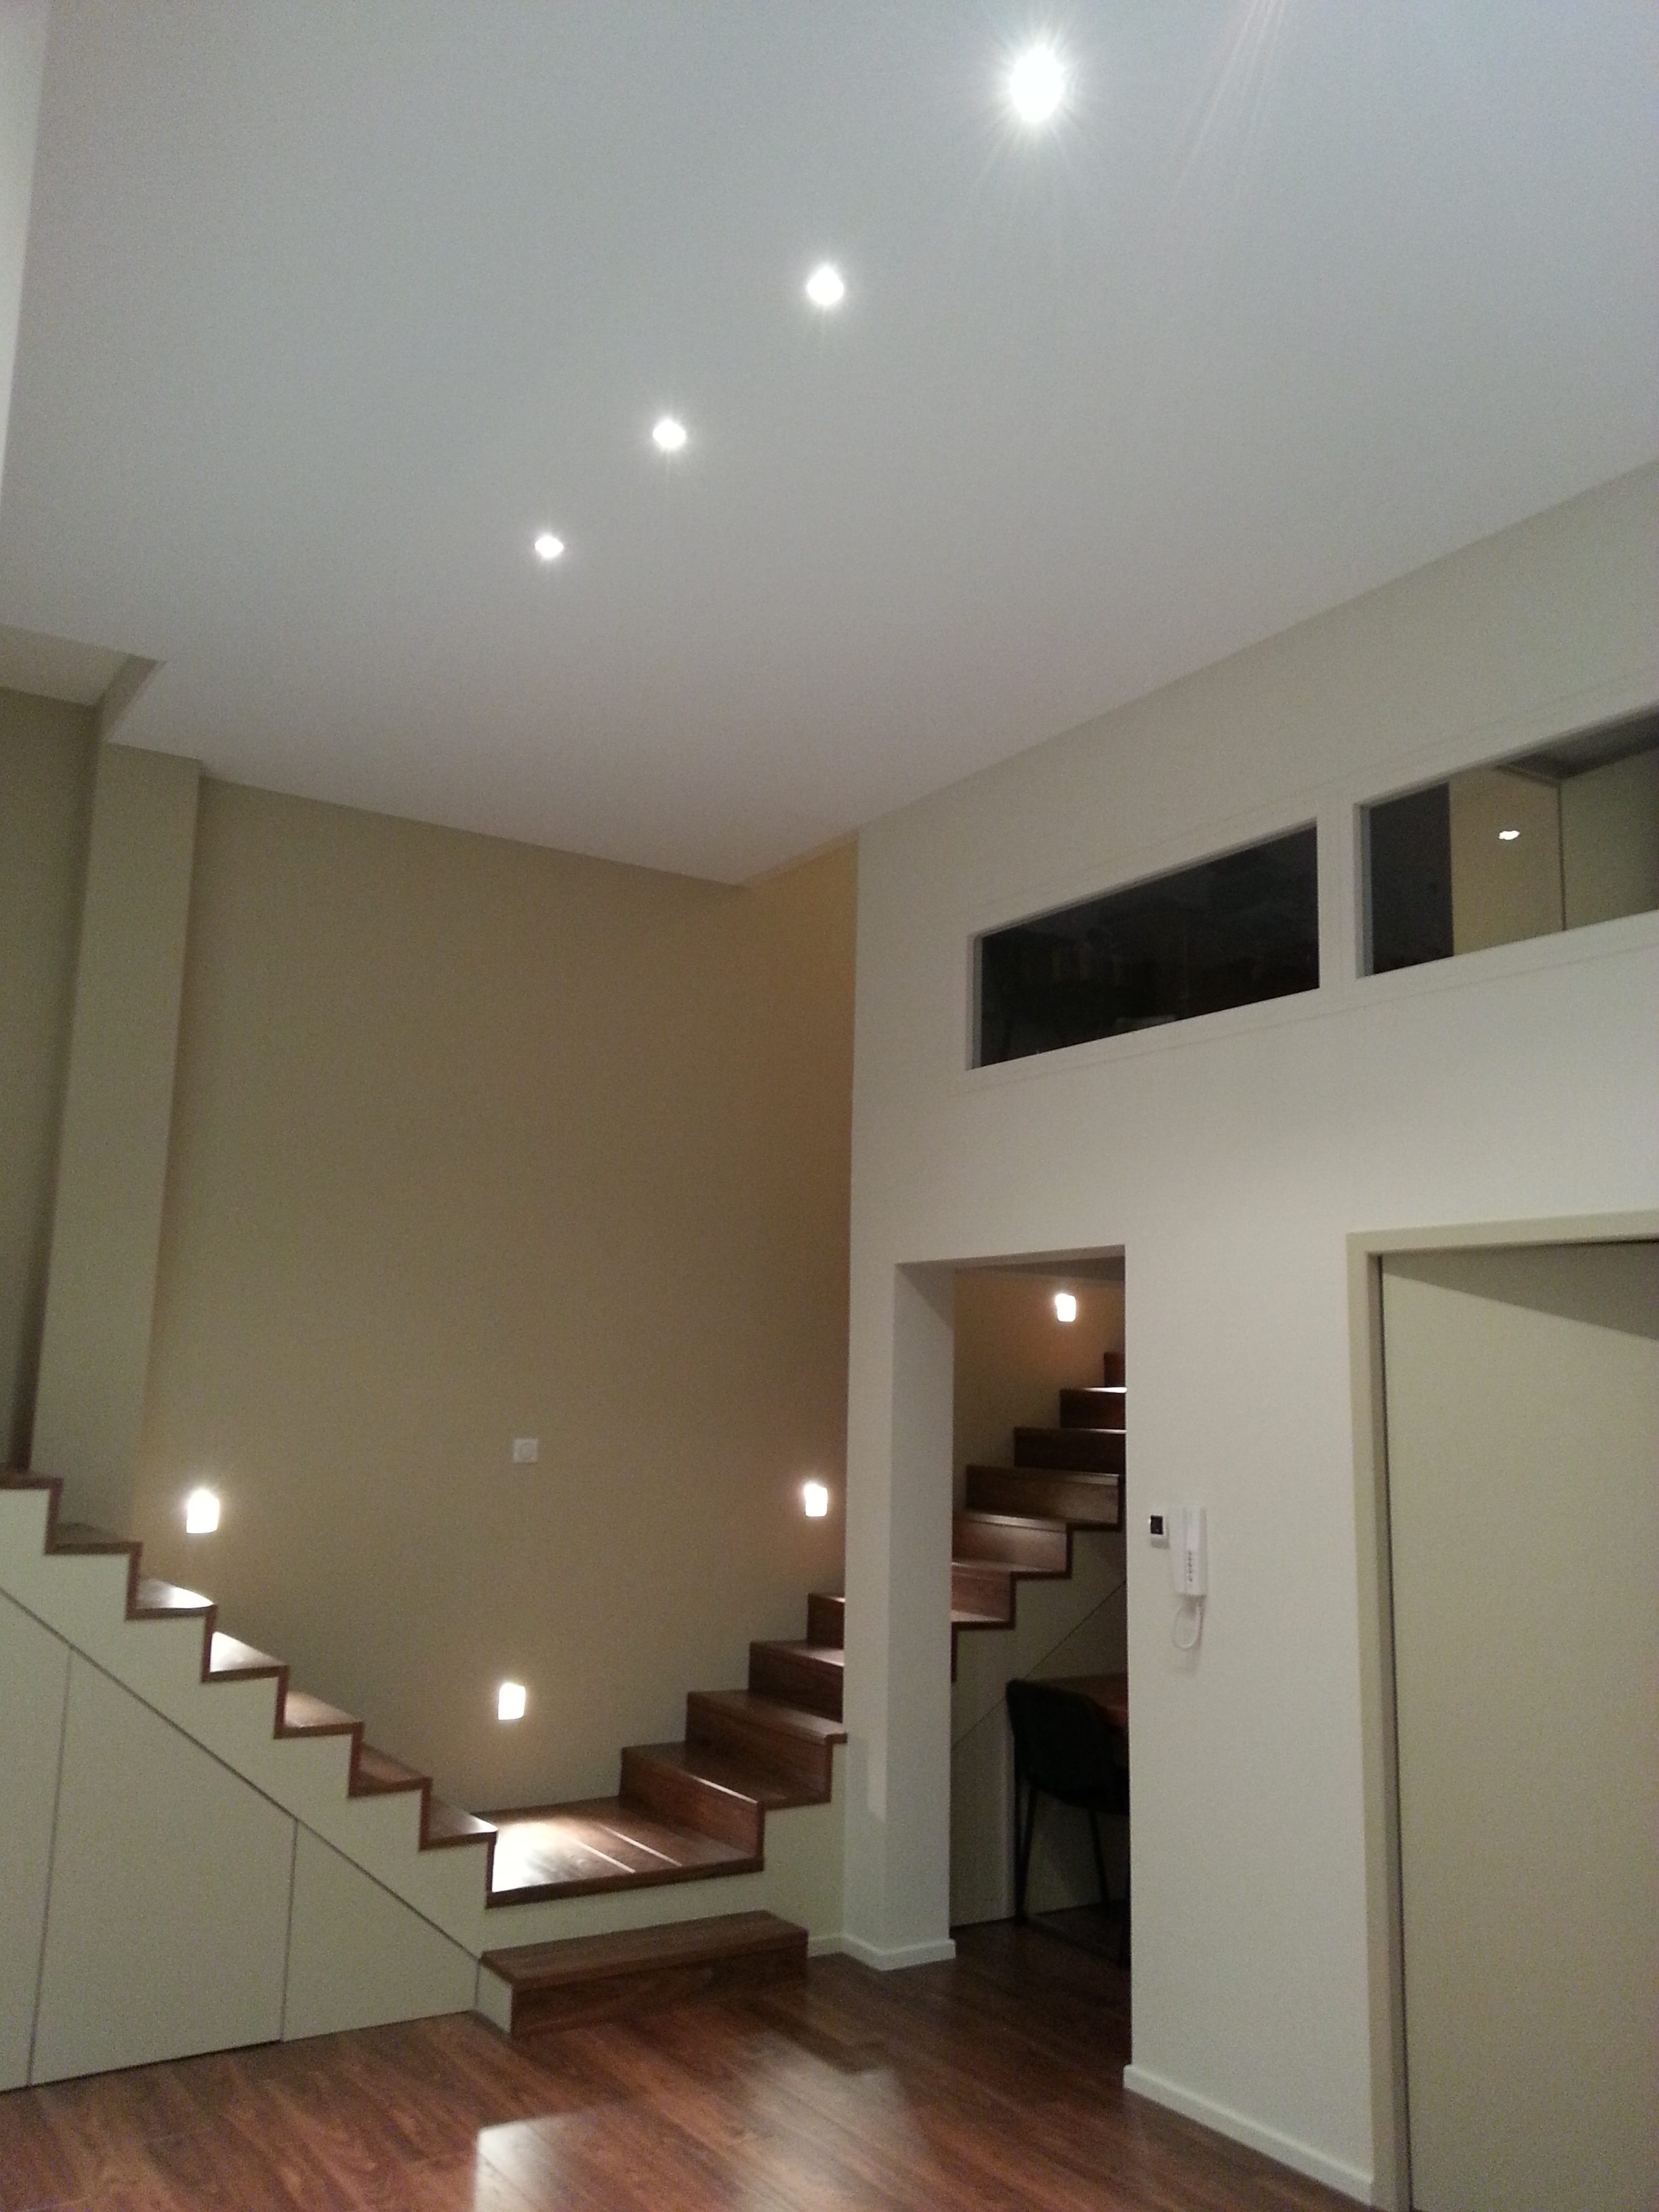 Eclairage plafond tendu